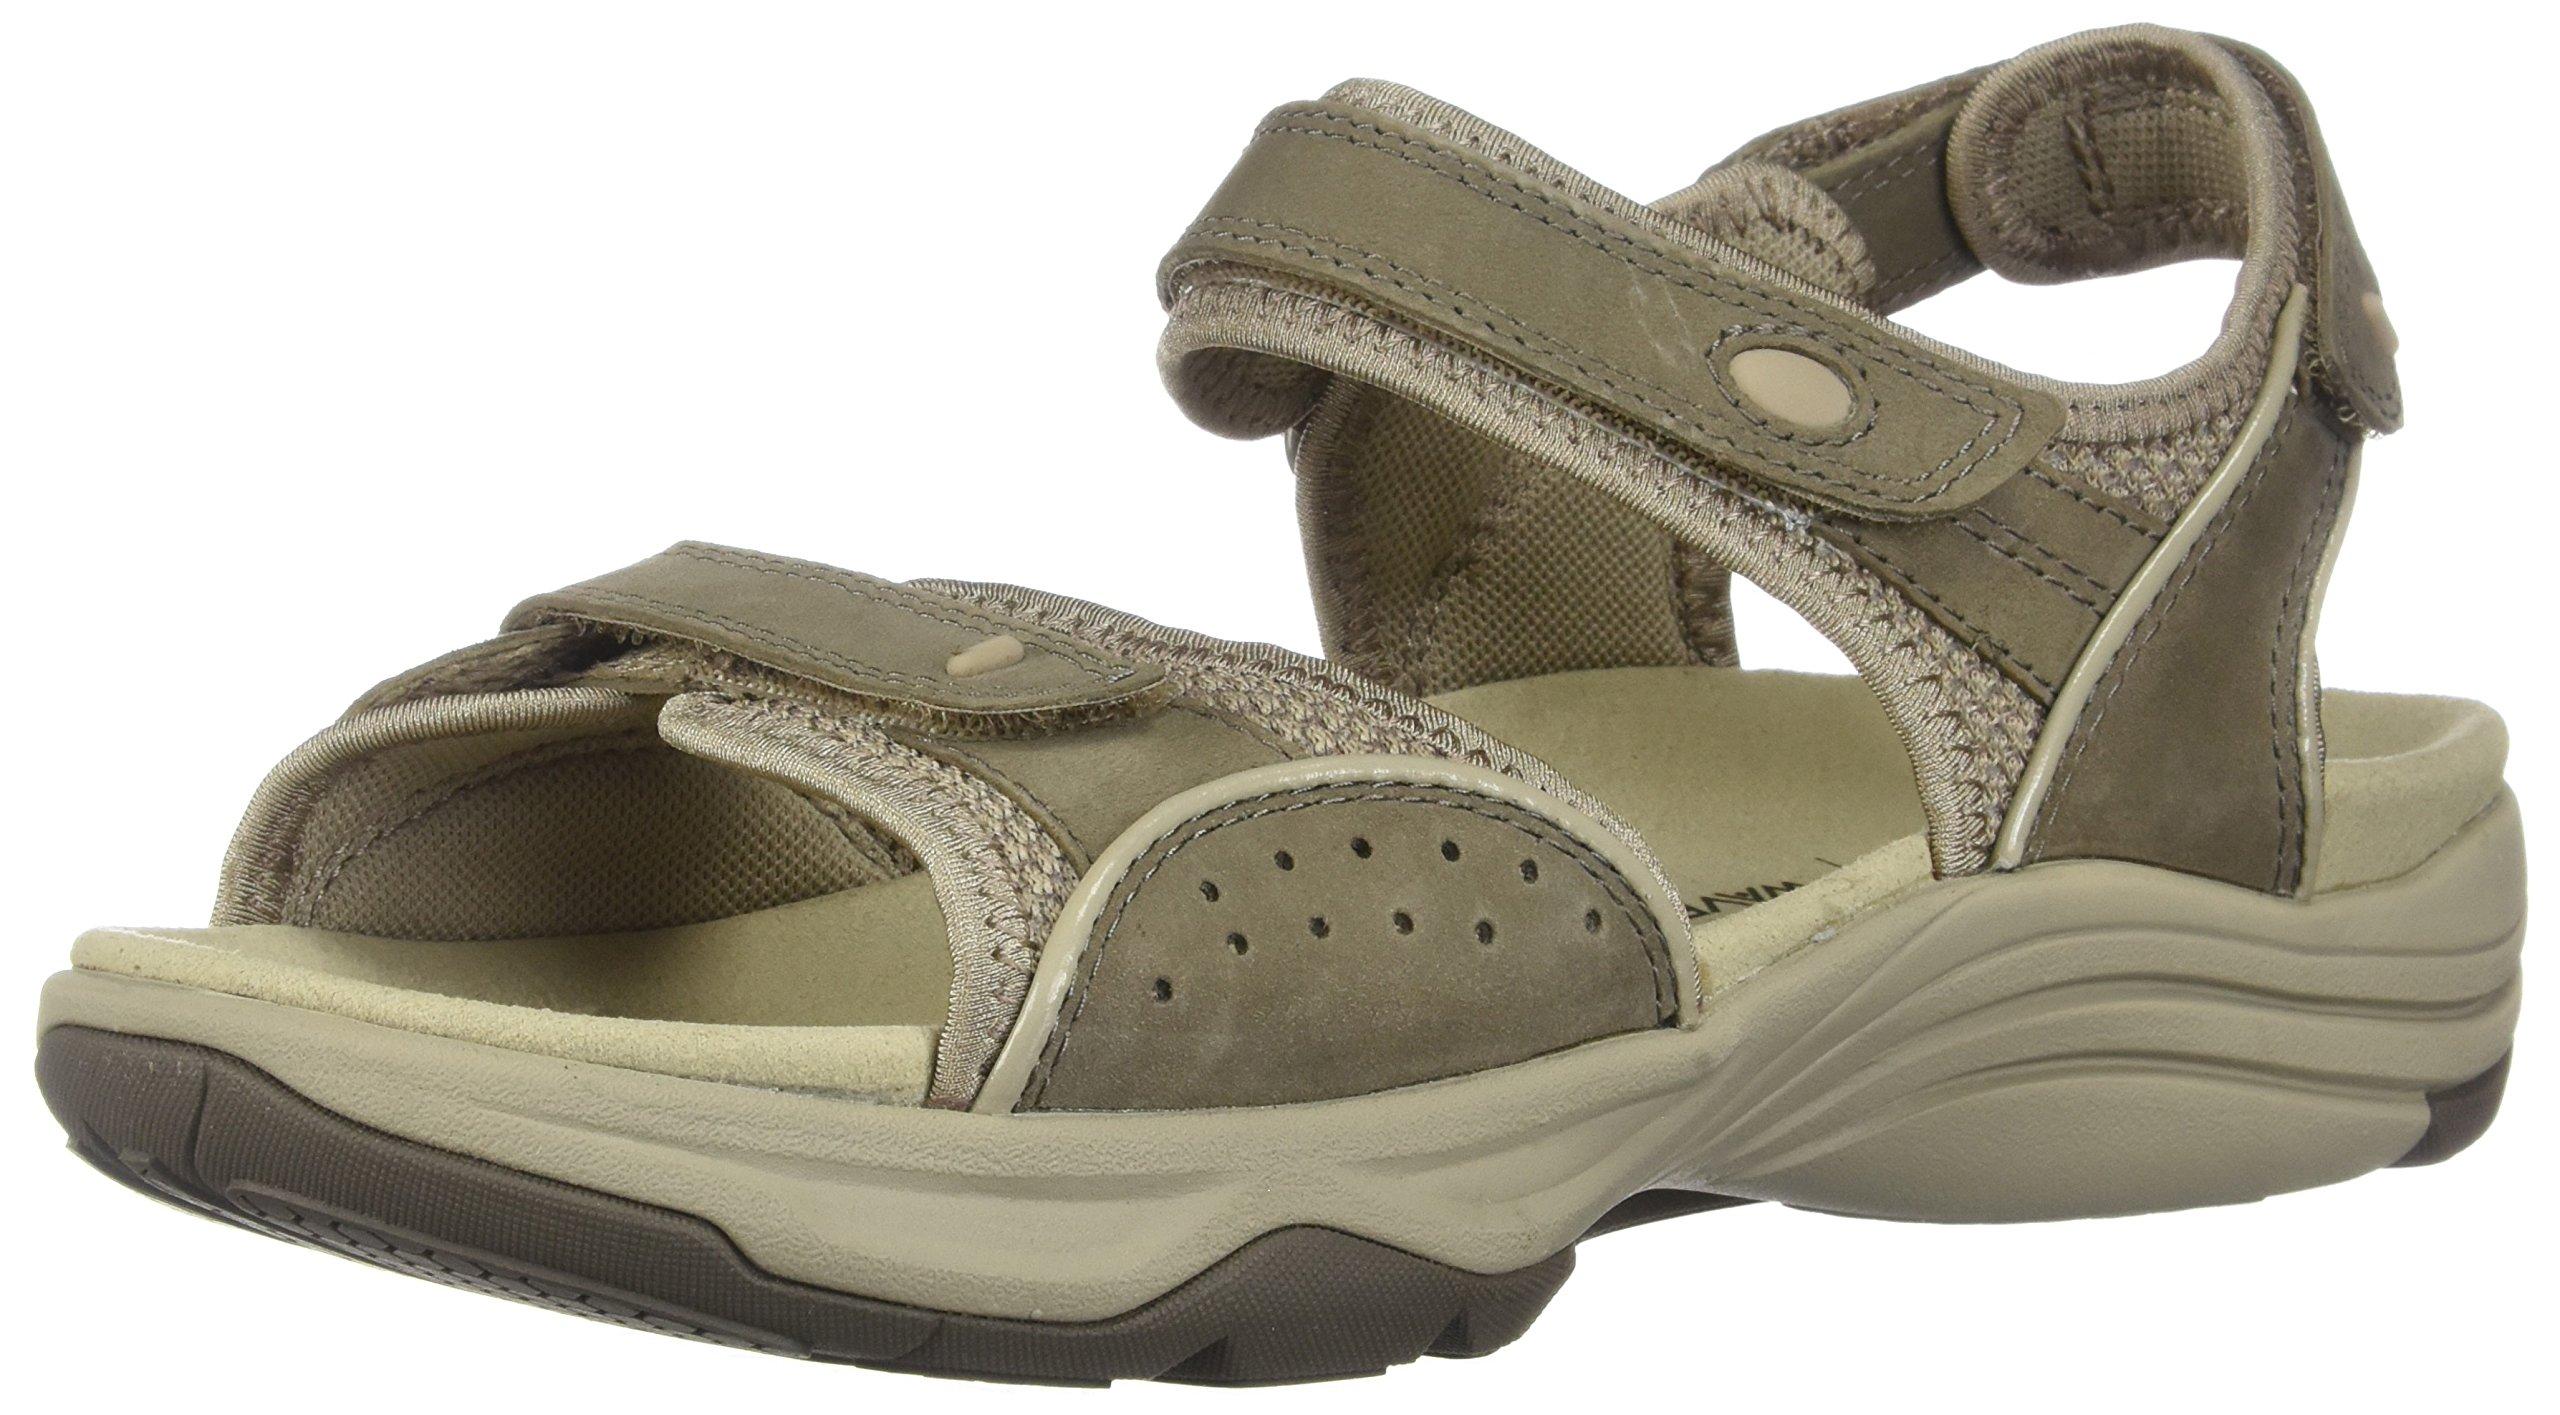 CLARKS Womens Wave Grip Sport Sandal, Sage, 8.5 B(M) US